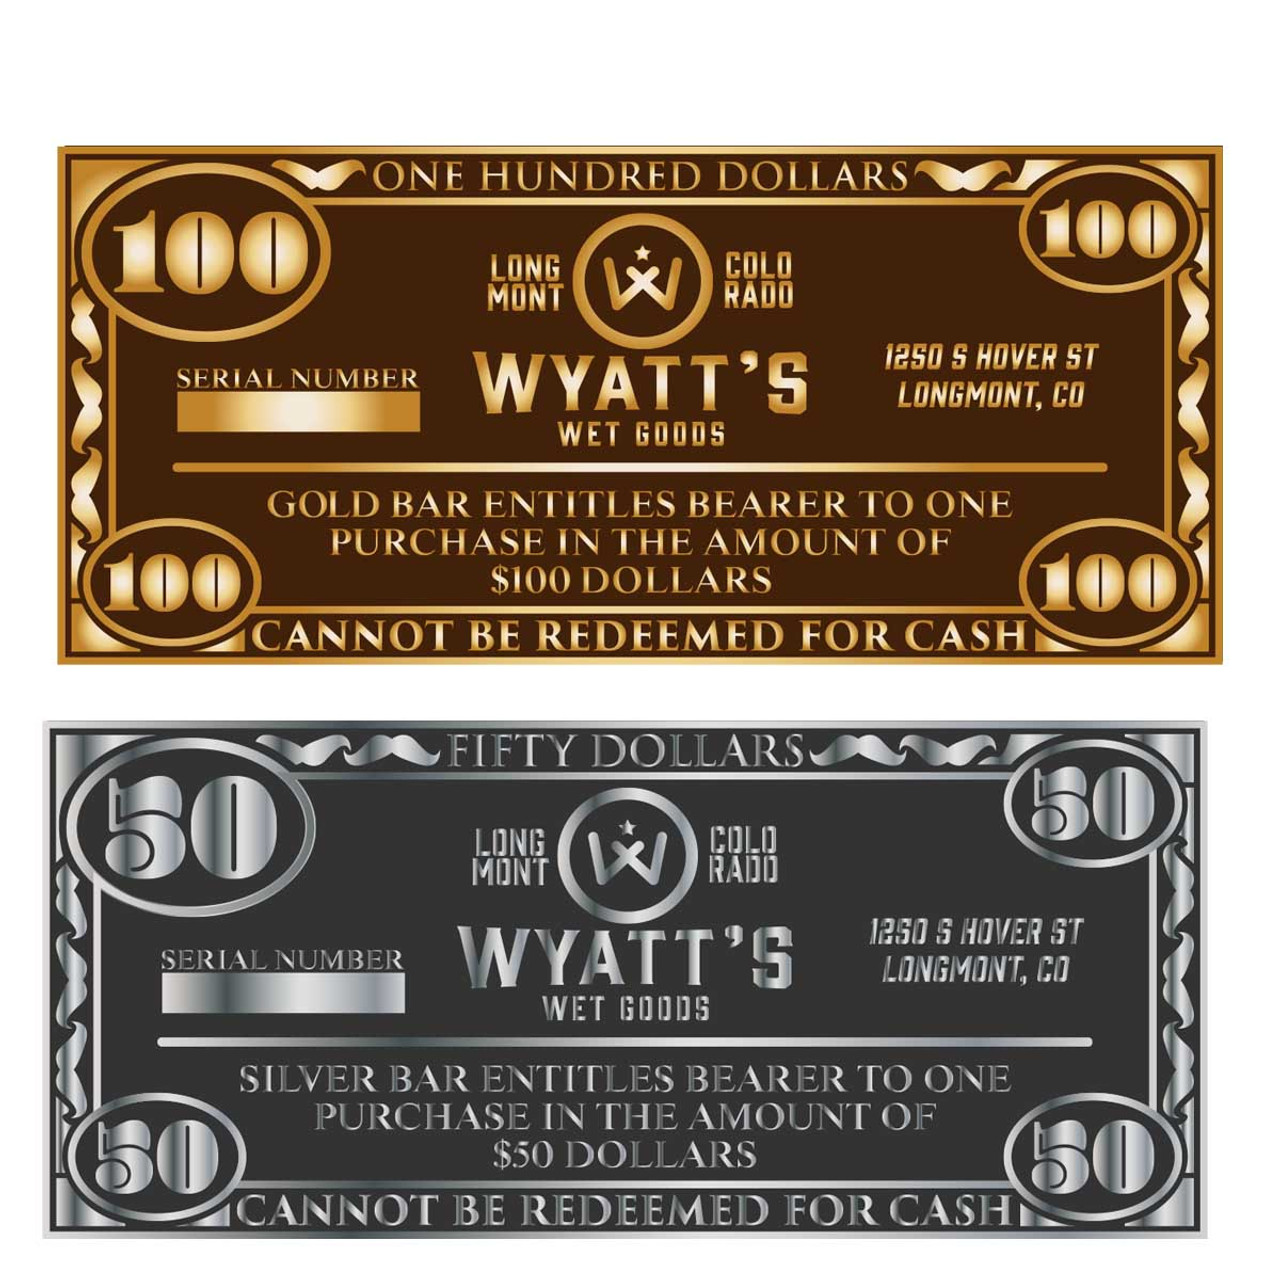 Wyatt's Wet Goods $50 bronze Bar (RESTRICTED)